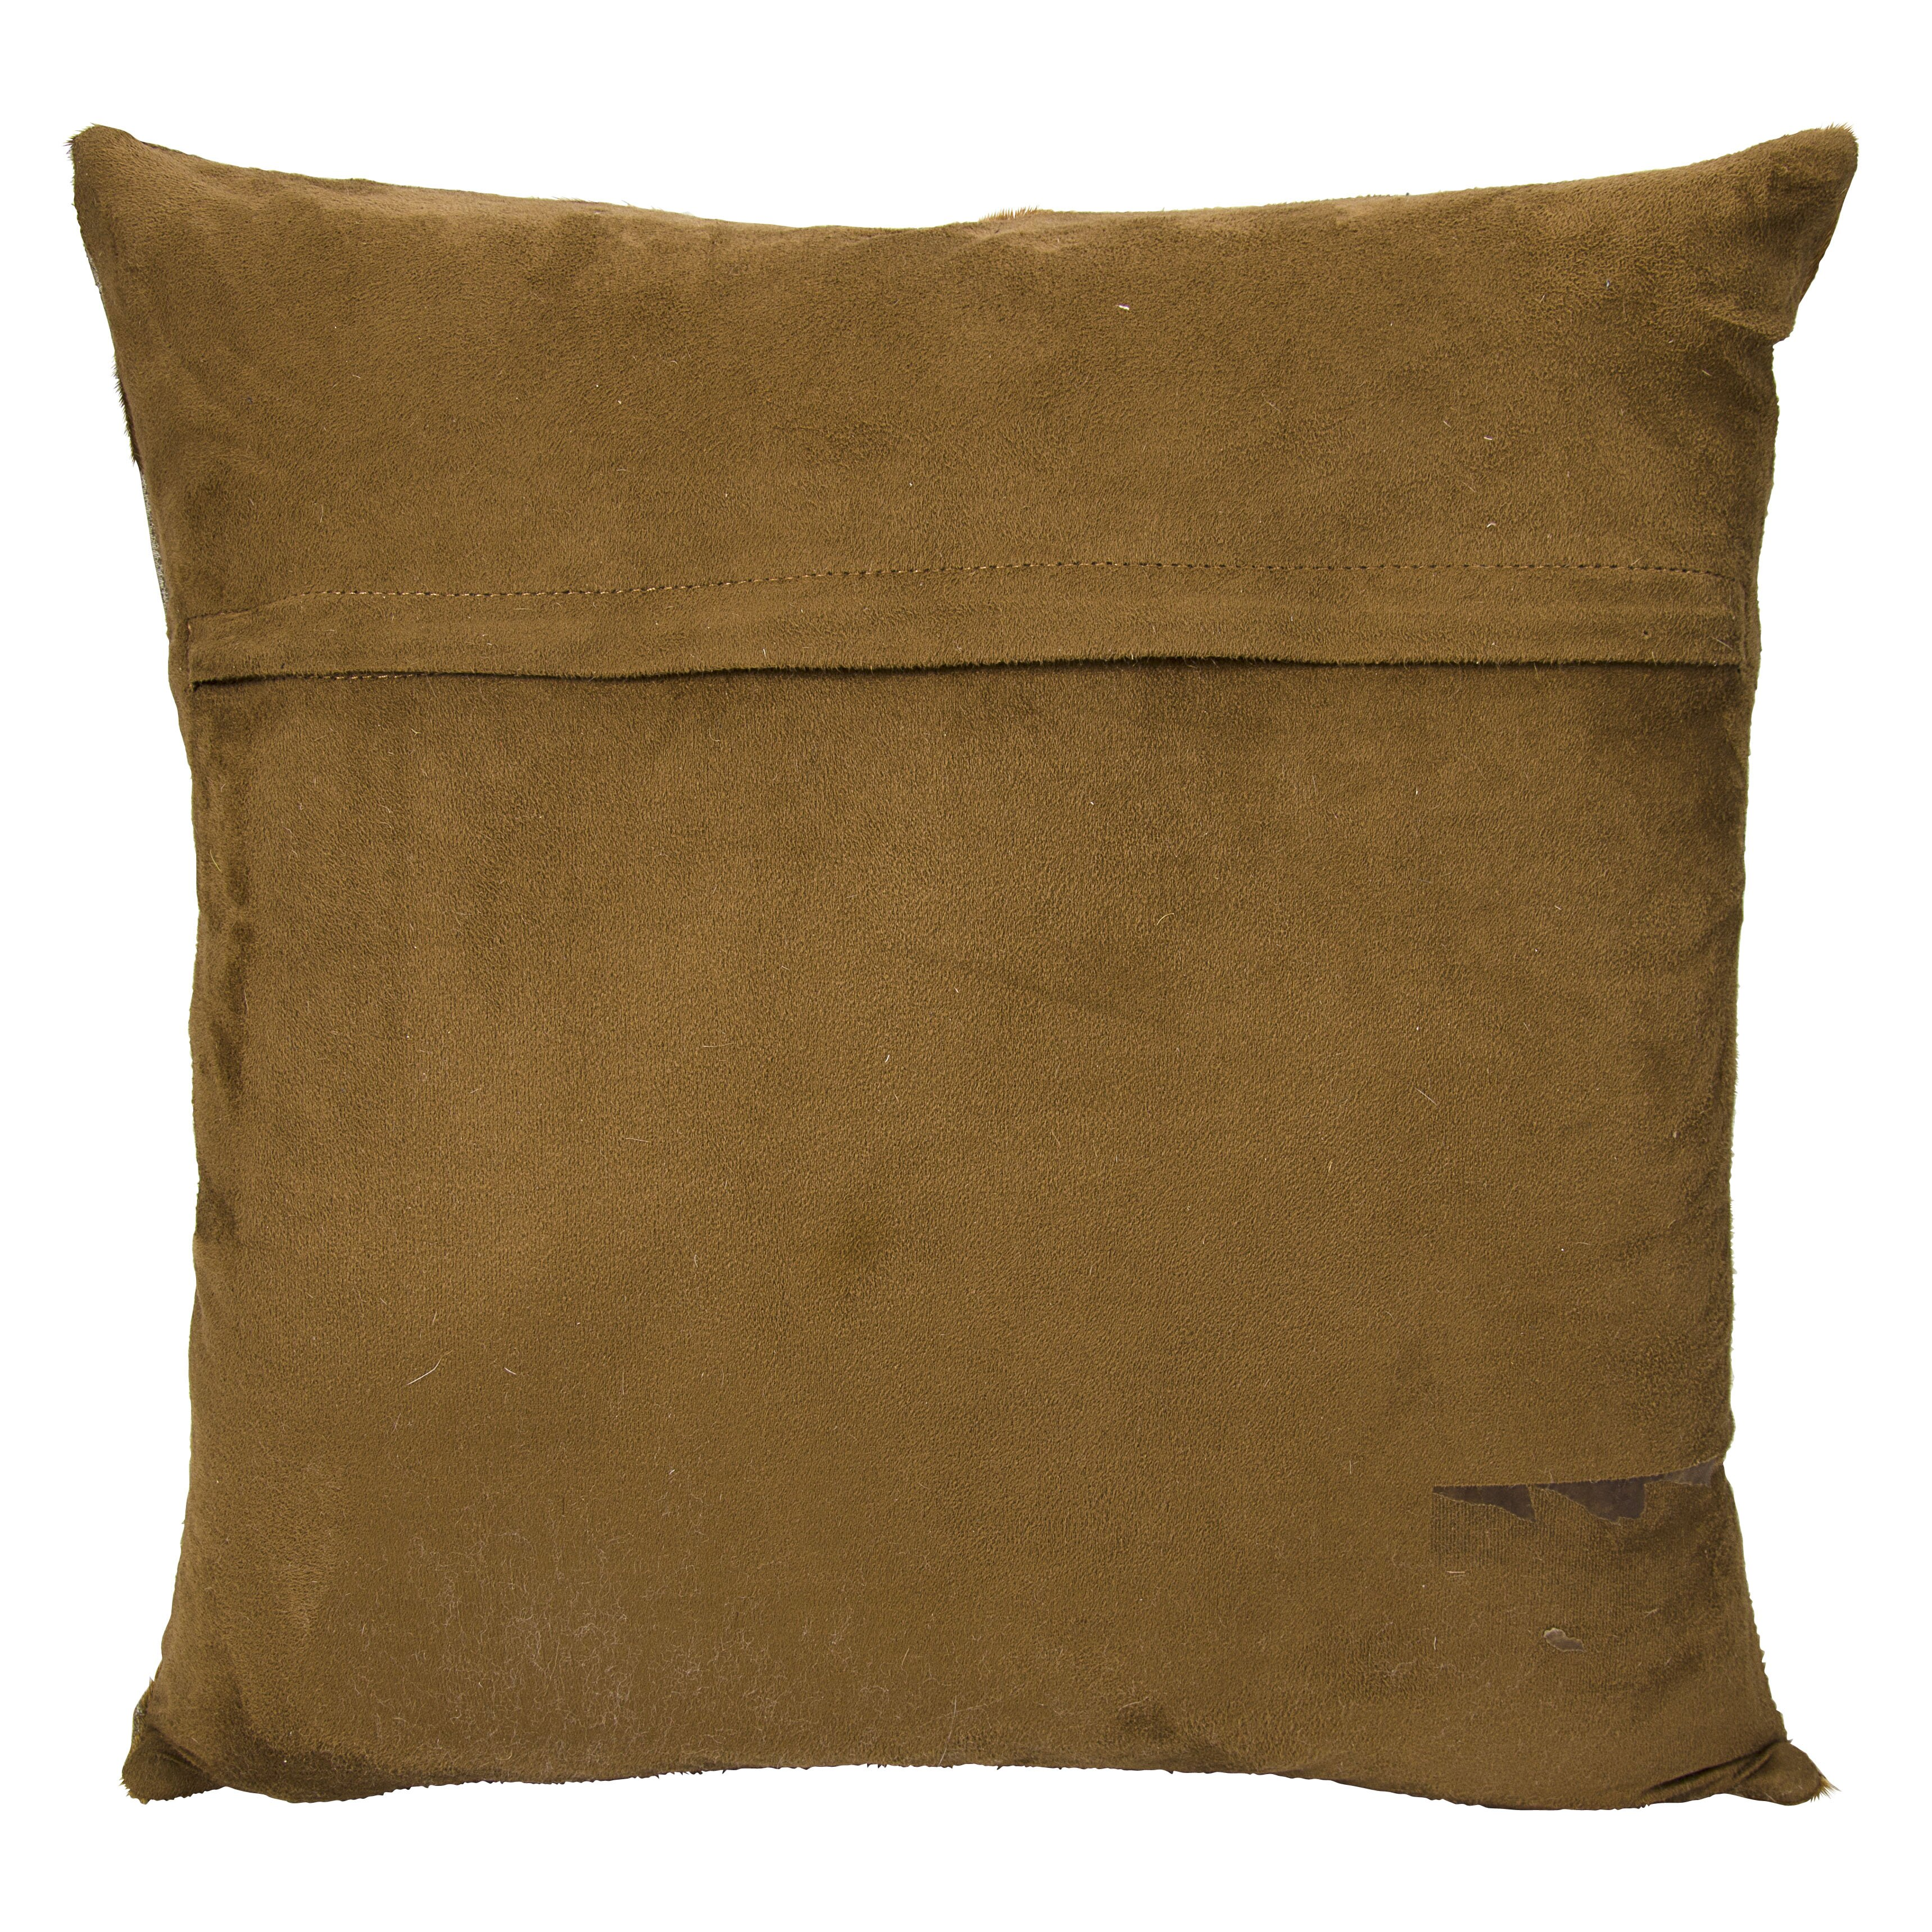 Throw Pillow Leather : Trent Austin Design Agate Infinity Square Leather Throw Pillow Wayfair